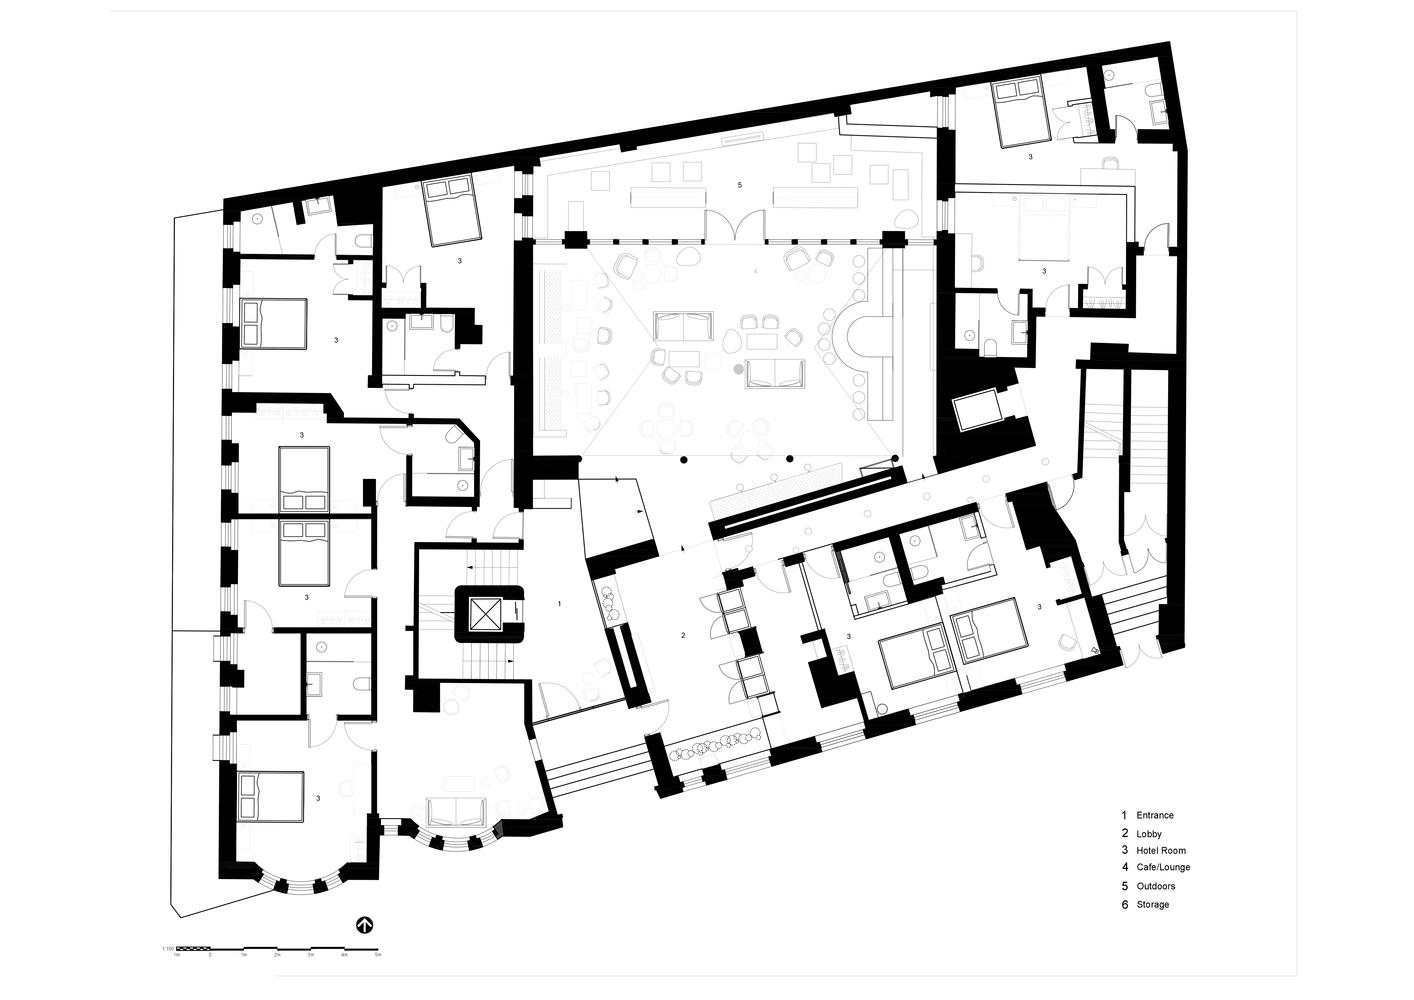 Gallery Of Mychelsea Boutique Hotel Design Haus Liberty 21